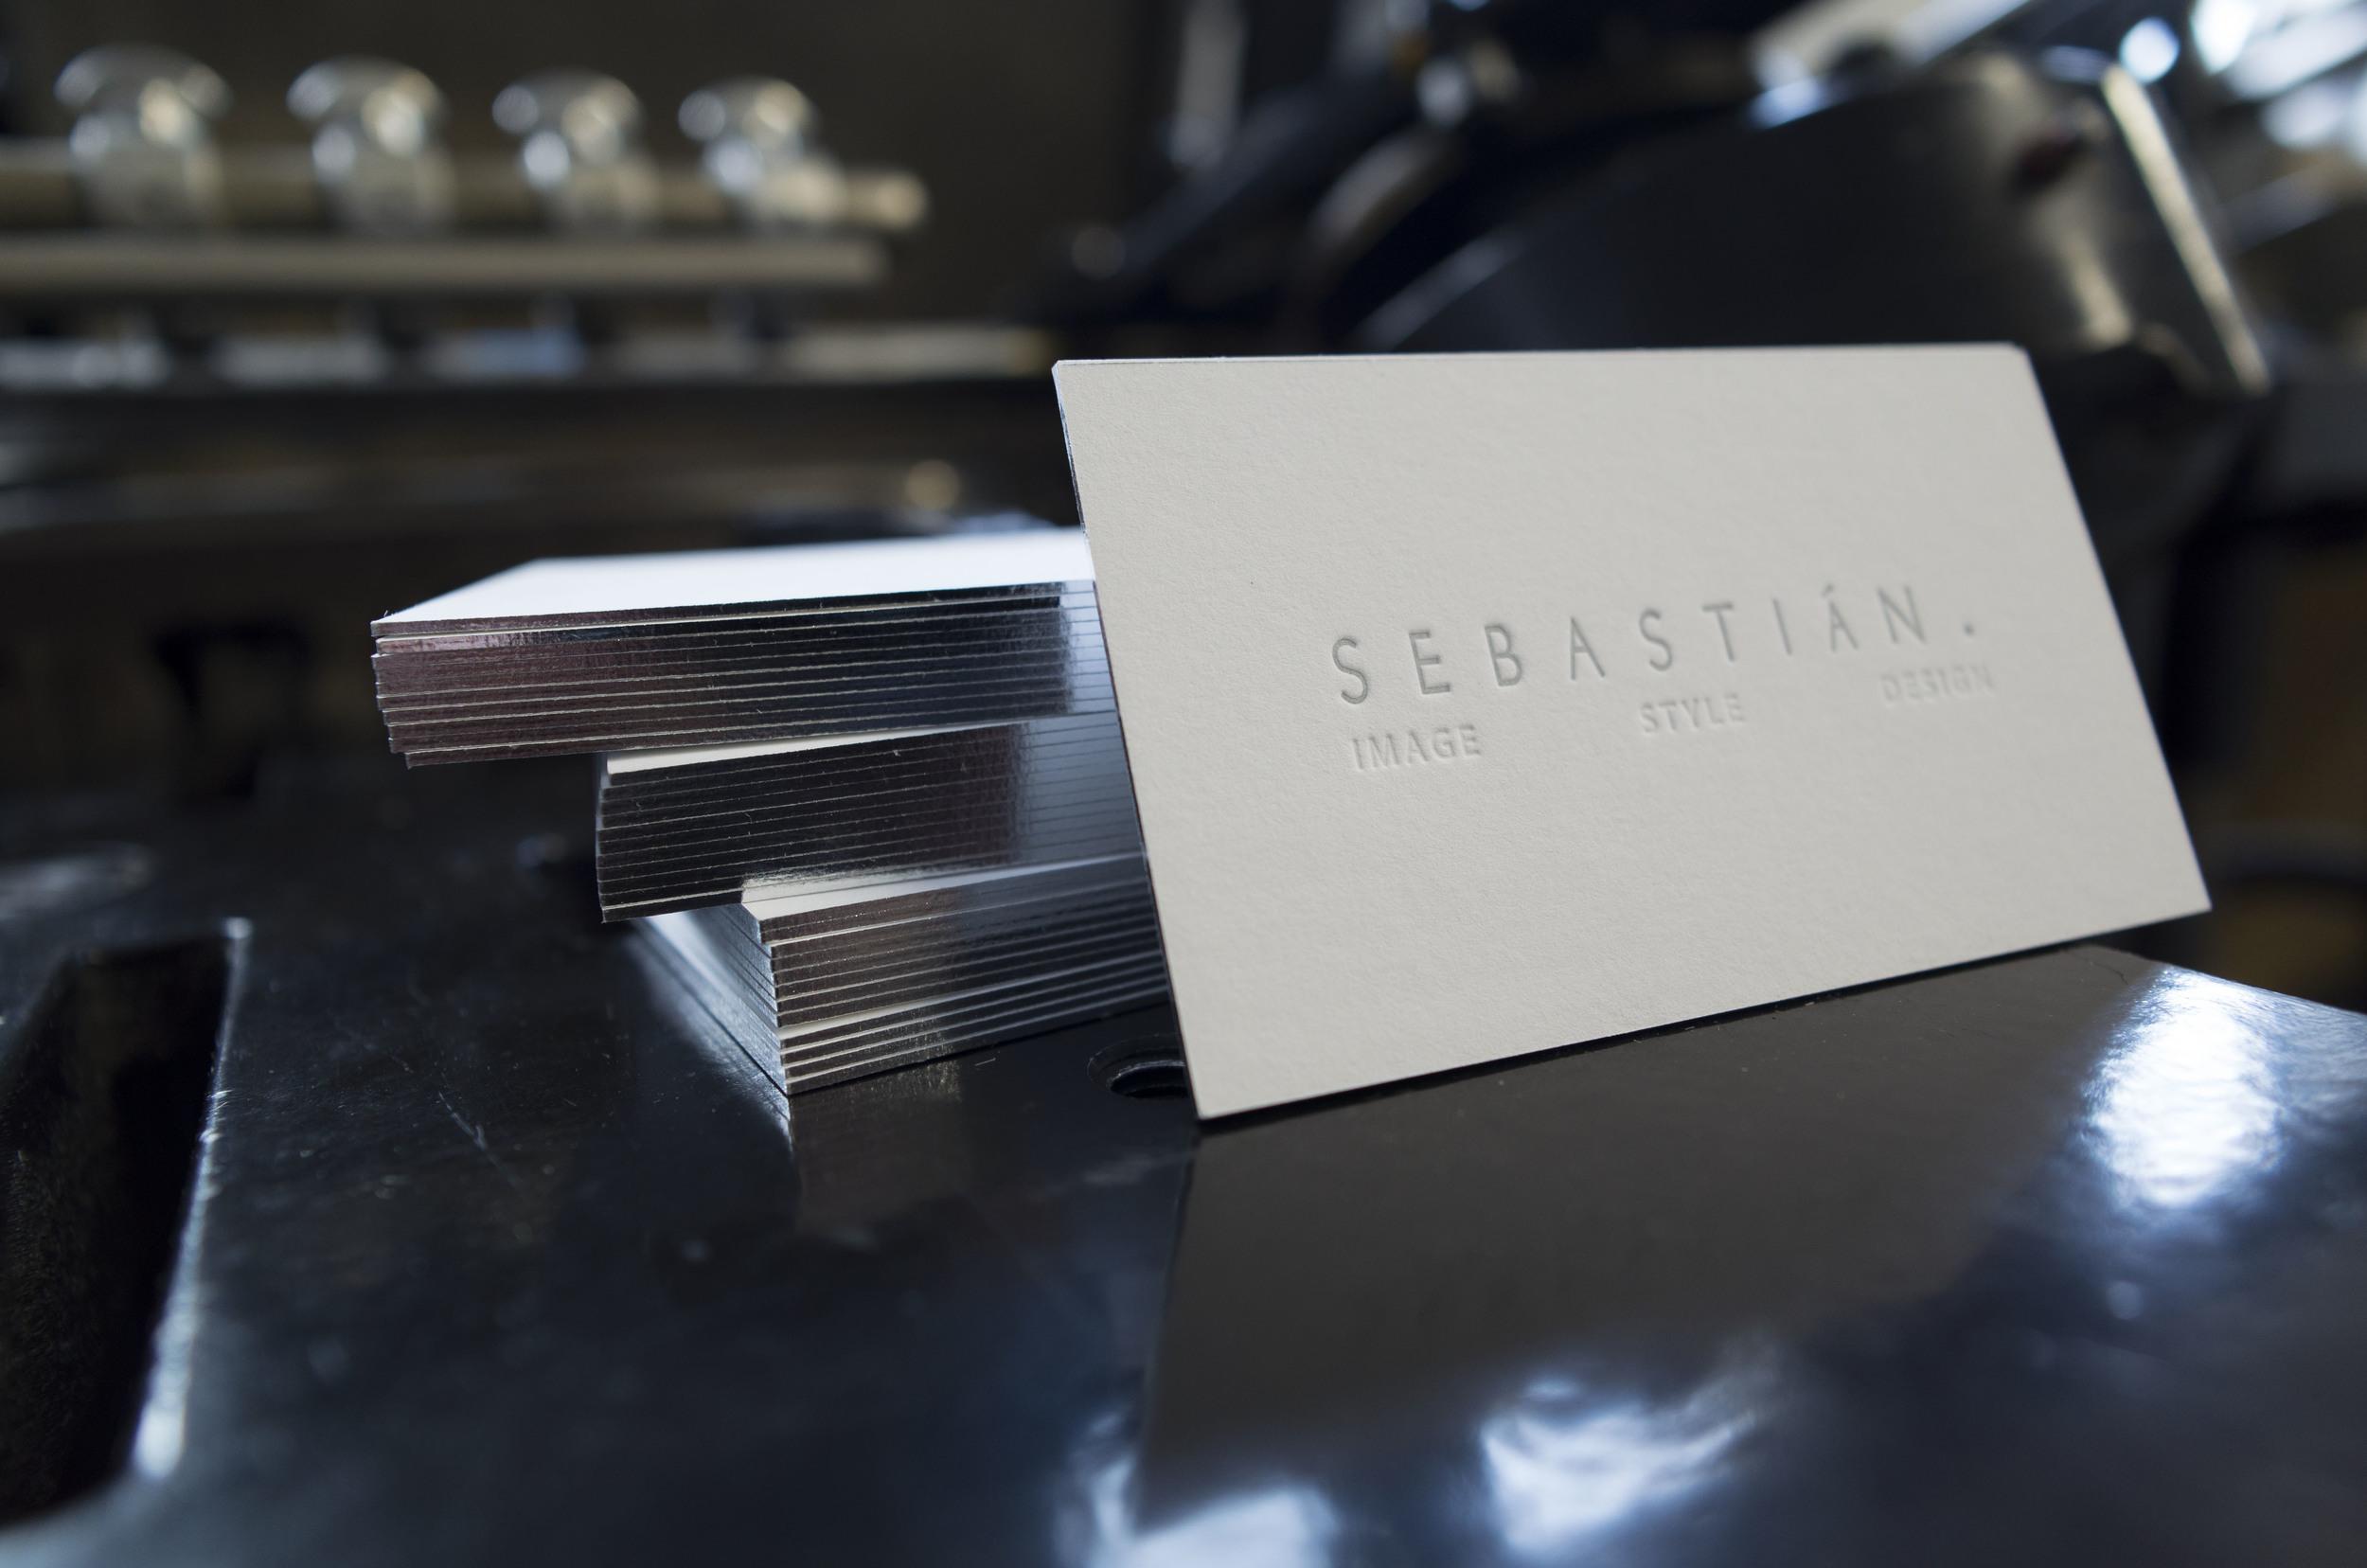 Sebastian.jpg